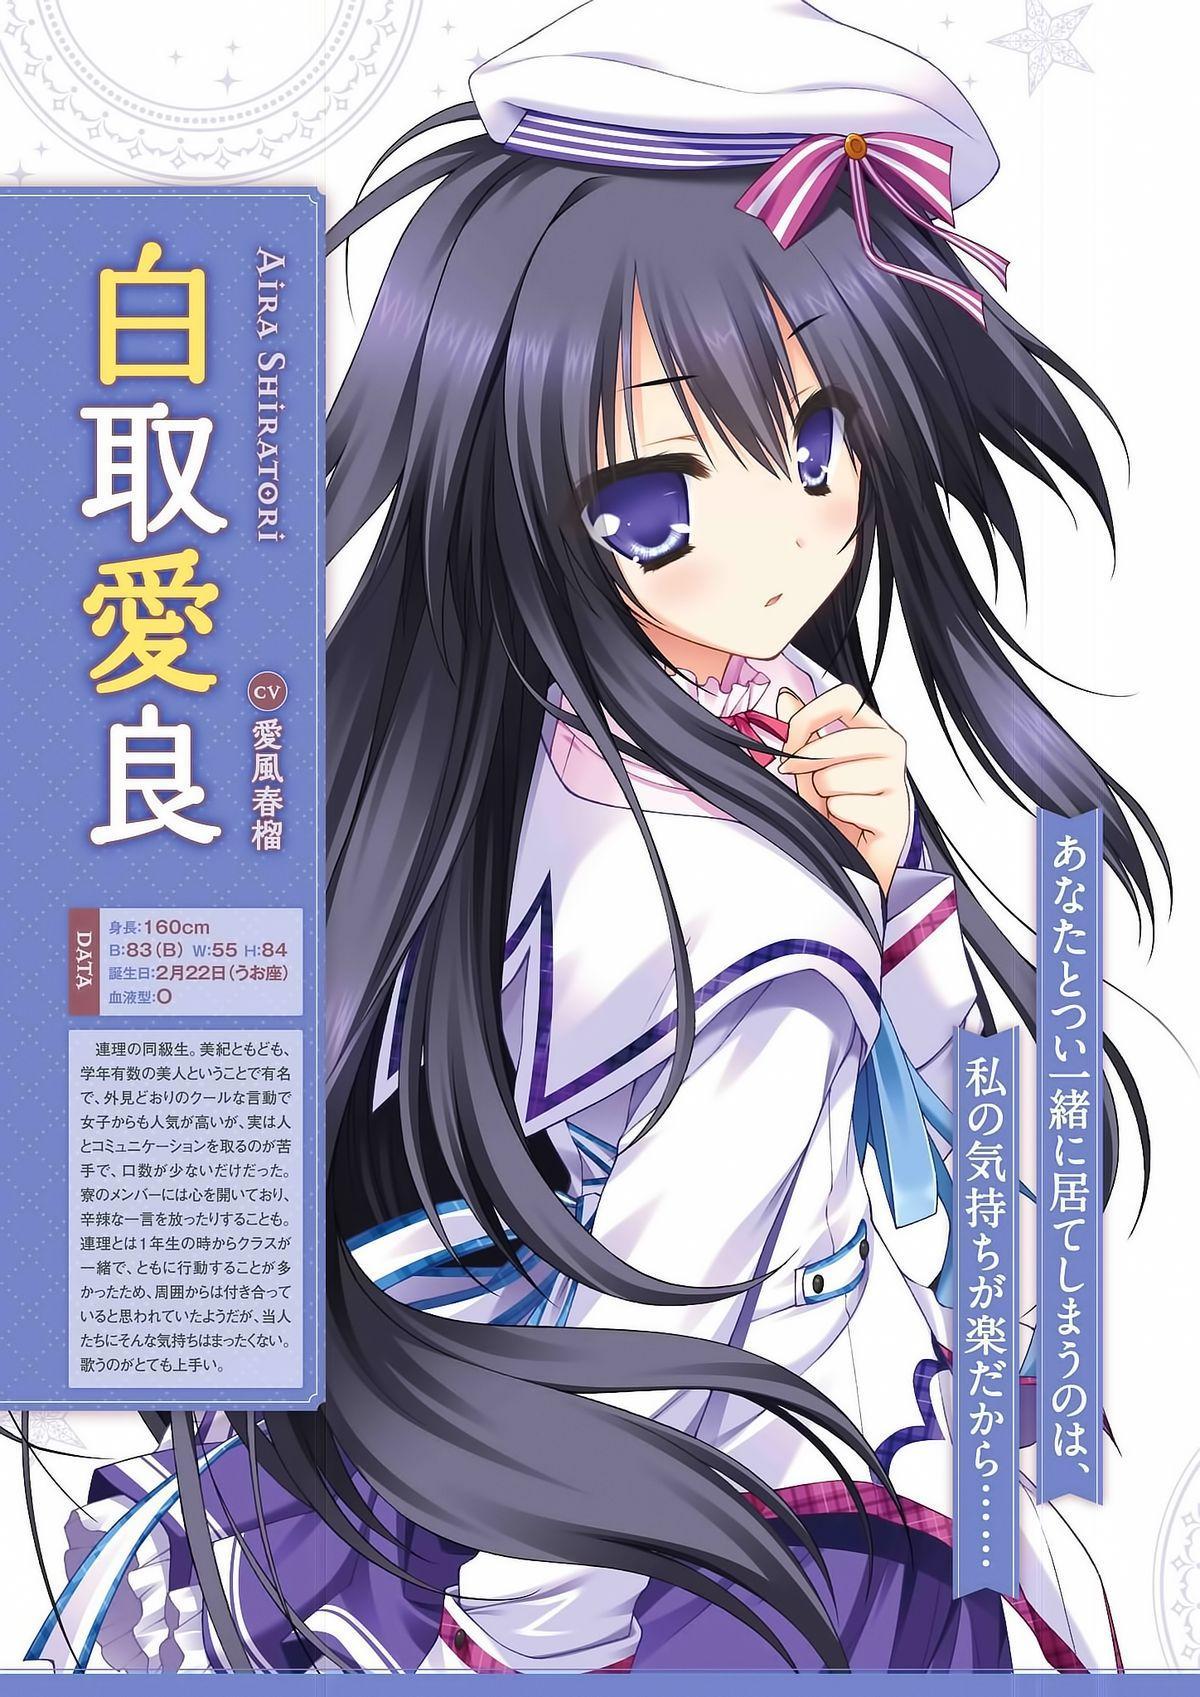 Sekai to Sekai no Mannaka de Visual Fanbook 43